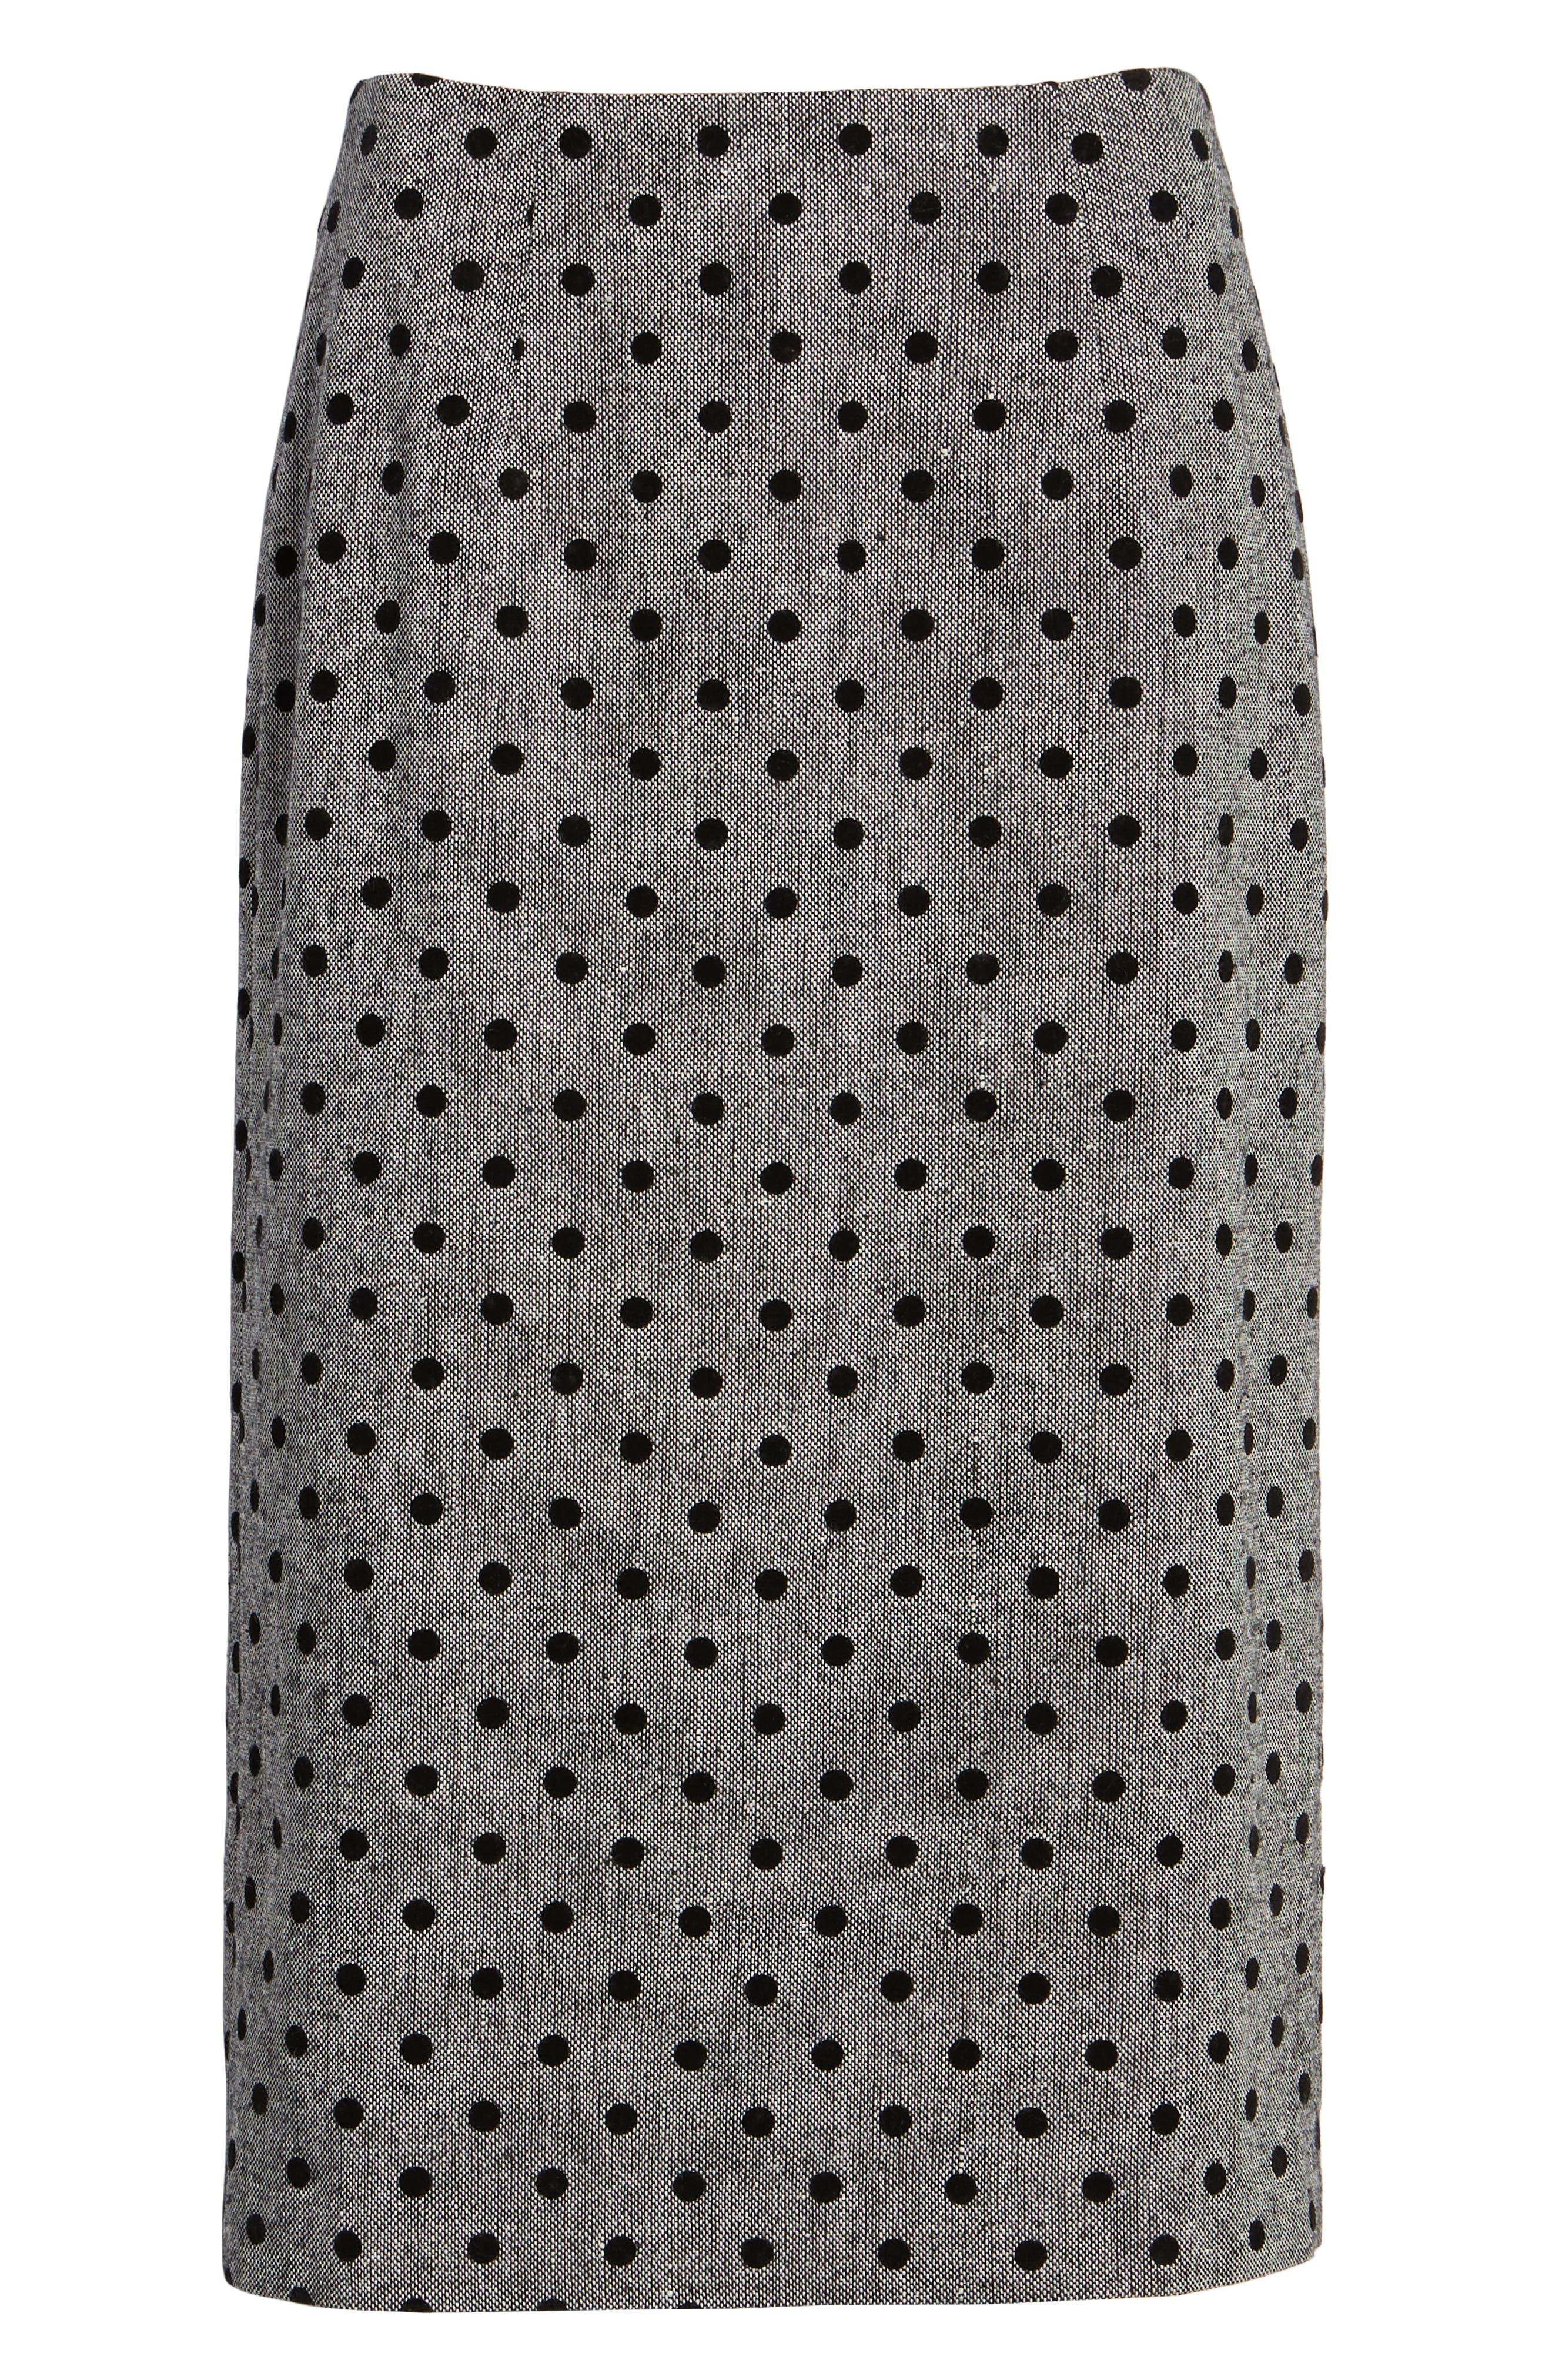 Dot Pencil Skirt,                             Alternate thumbnail 6, color,                             GREY- BLACK DOT